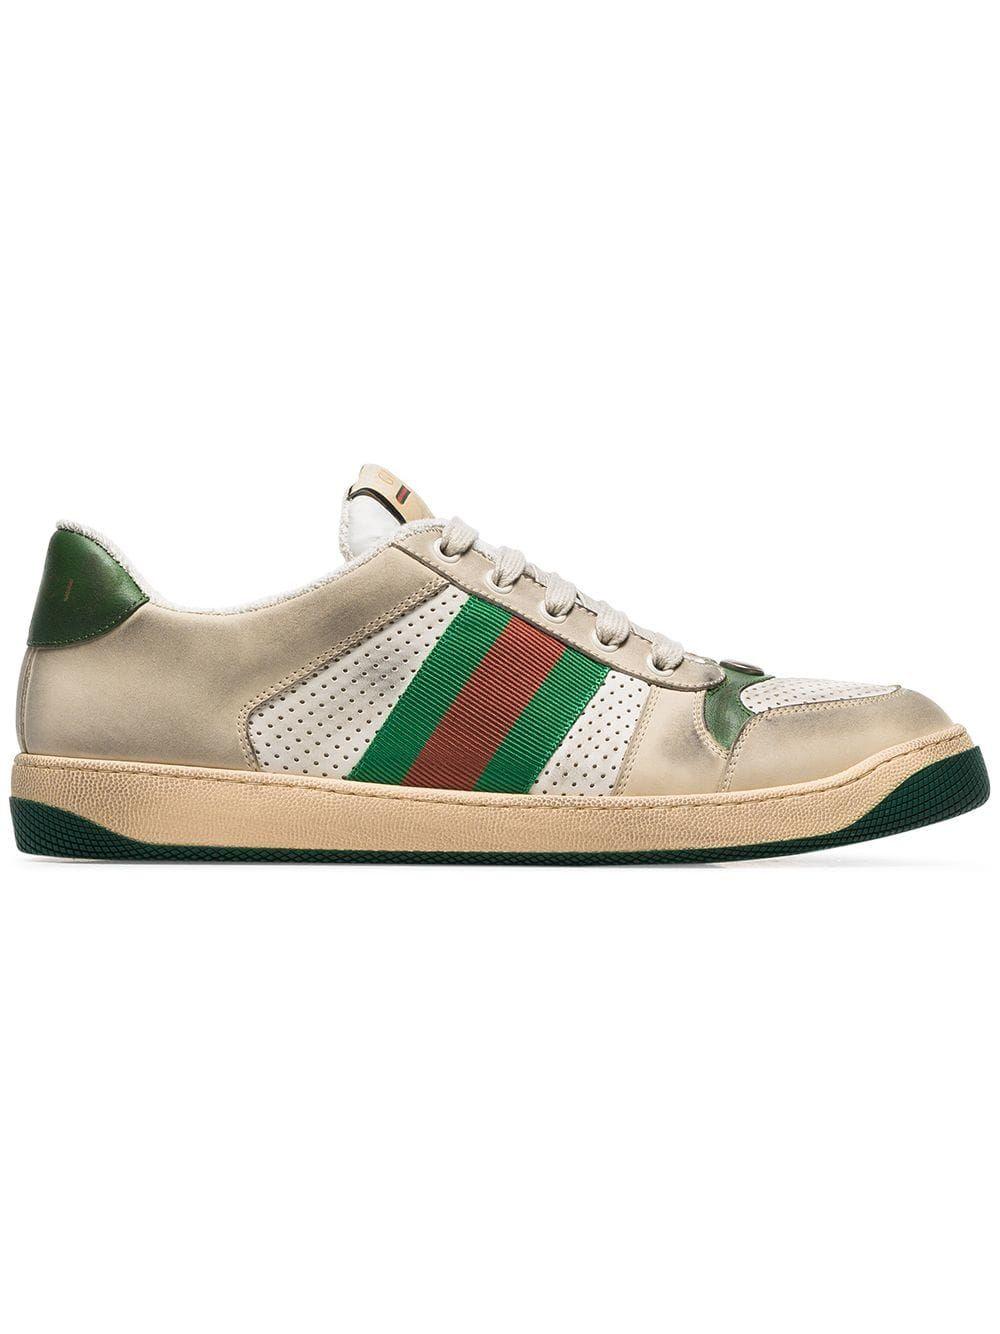 Gucci Gucci White Virtus Worn Effect Sneakers Neutrals Gucci